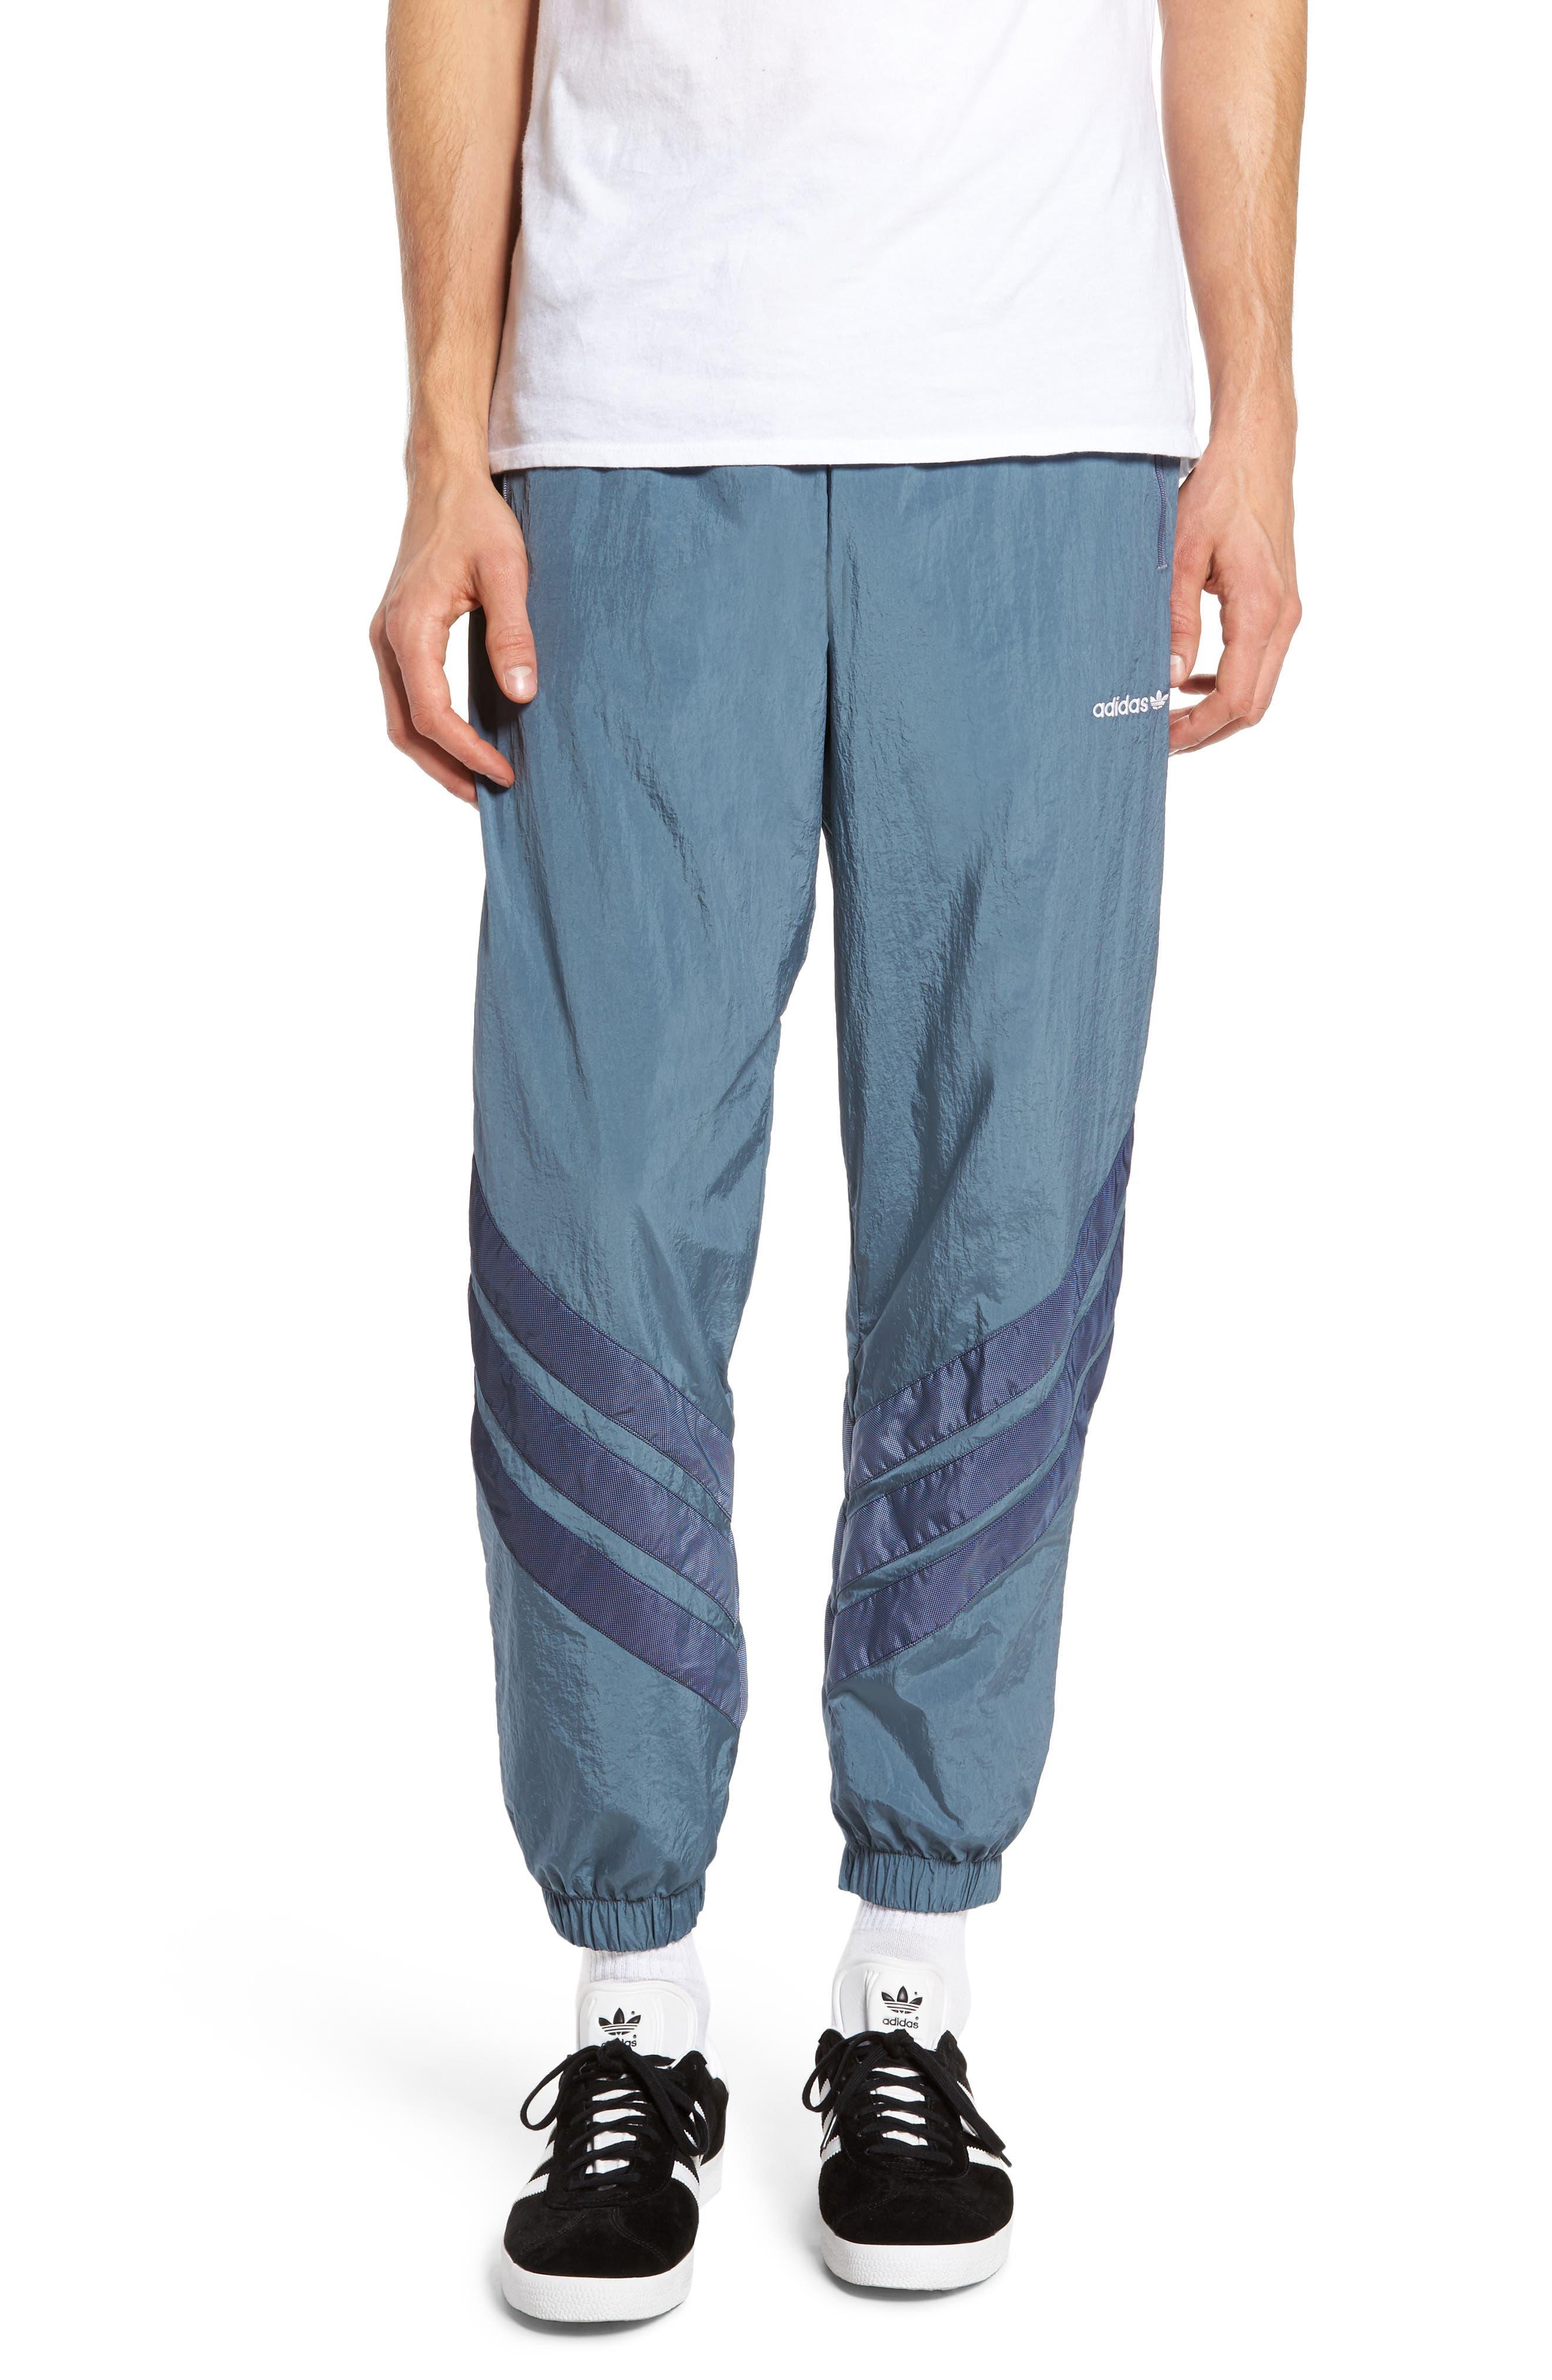 Originals V-Stripe Windpants,                         Main,                         color, Raw Steel/ White